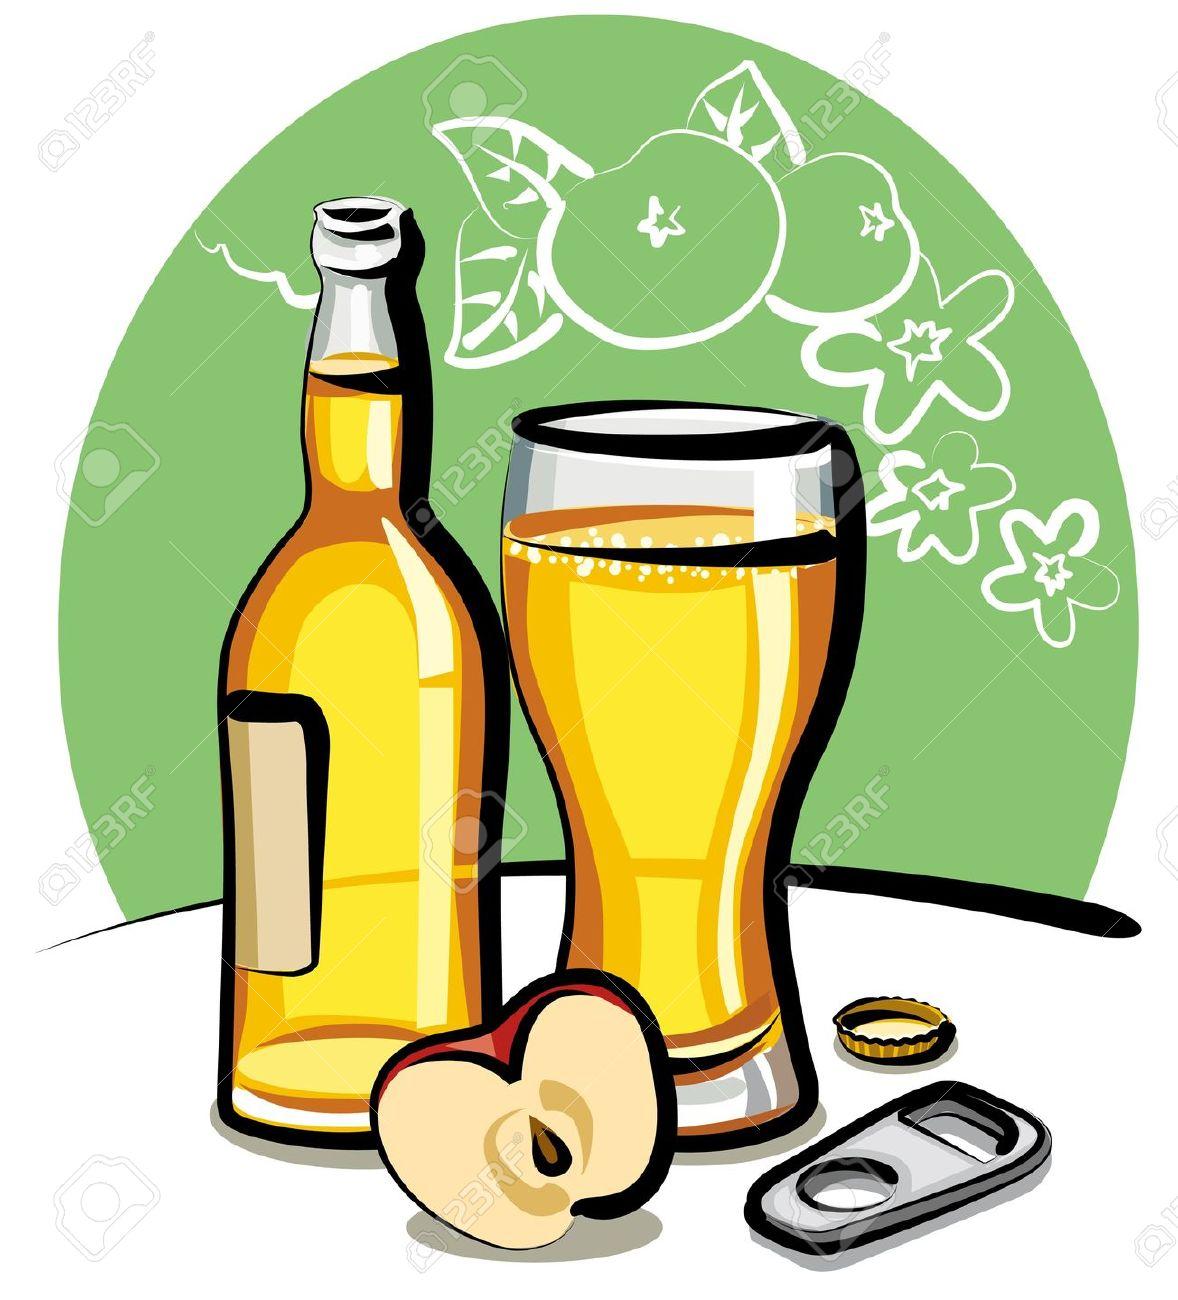 1178x1300 Beer Bottle Clip Art Free 101 Clip Art